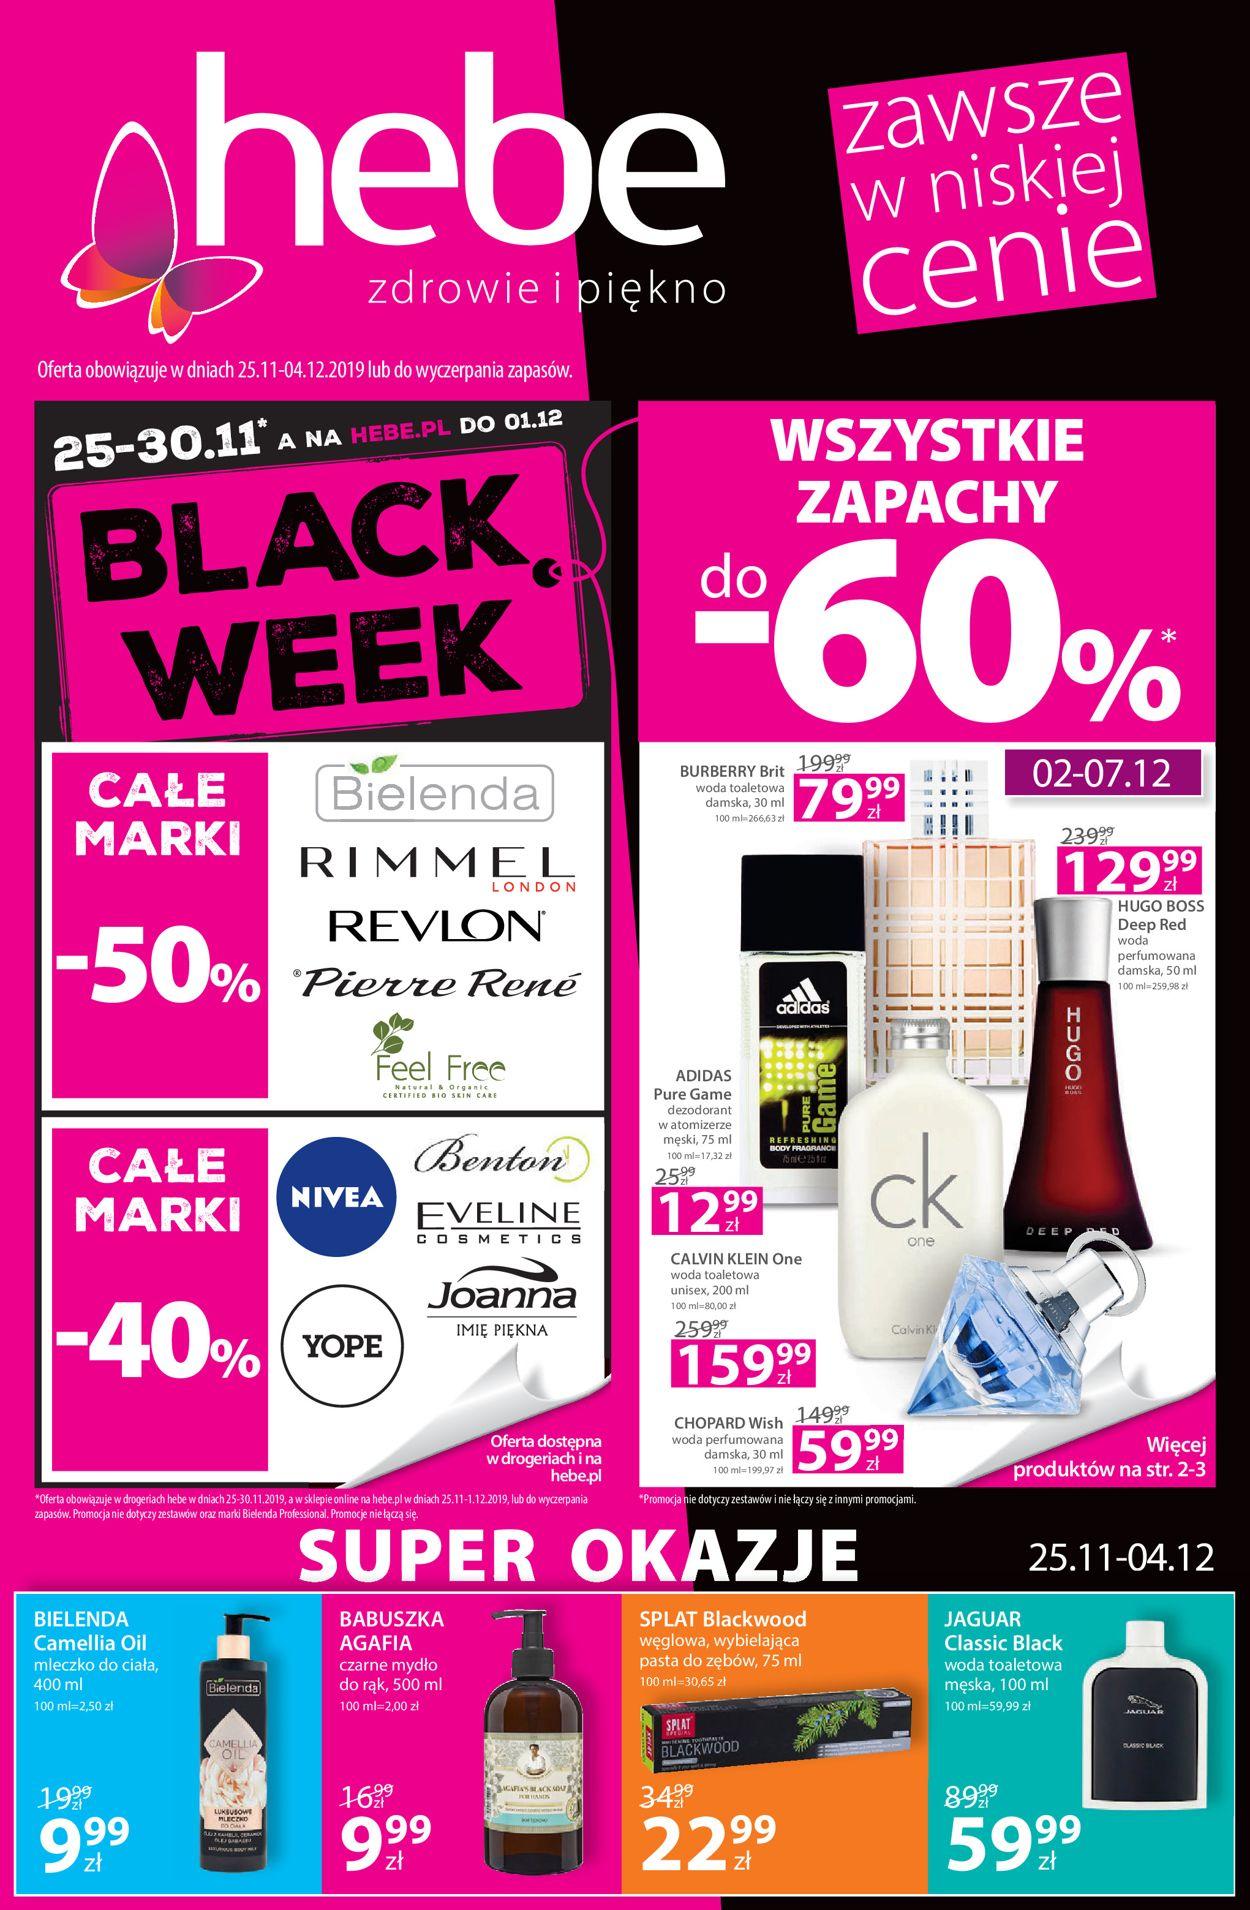 Gazetka promocyjna Hebe - Black Week - 25.11-04.12.2019